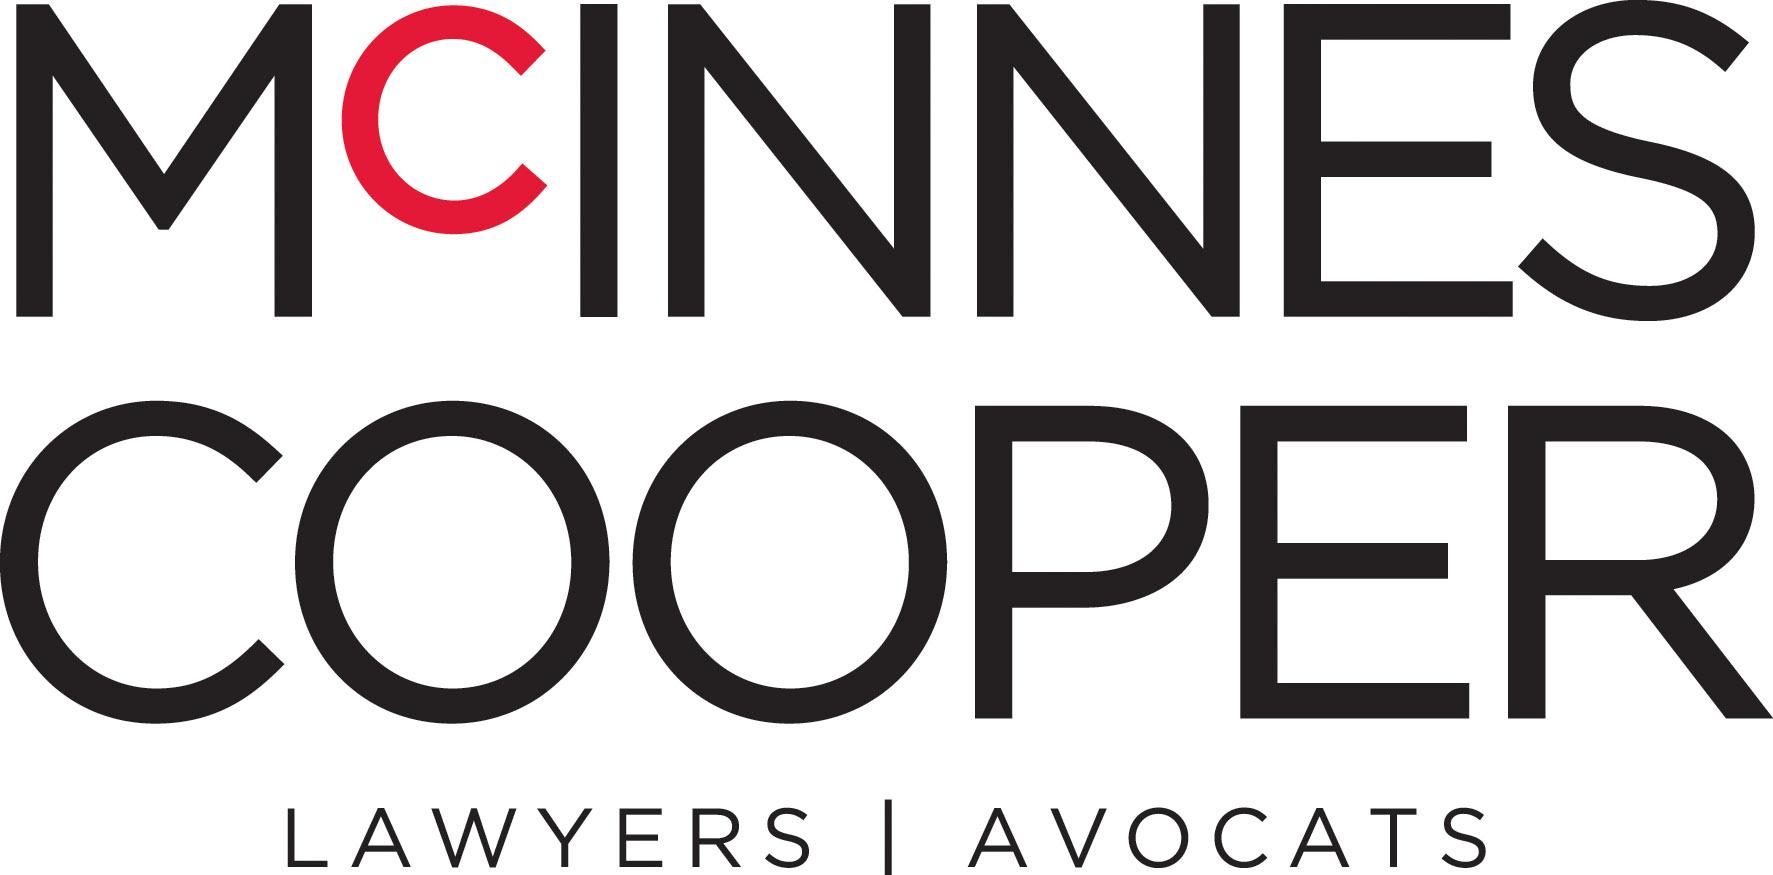 McInnes Cooper Thick Logo RGB